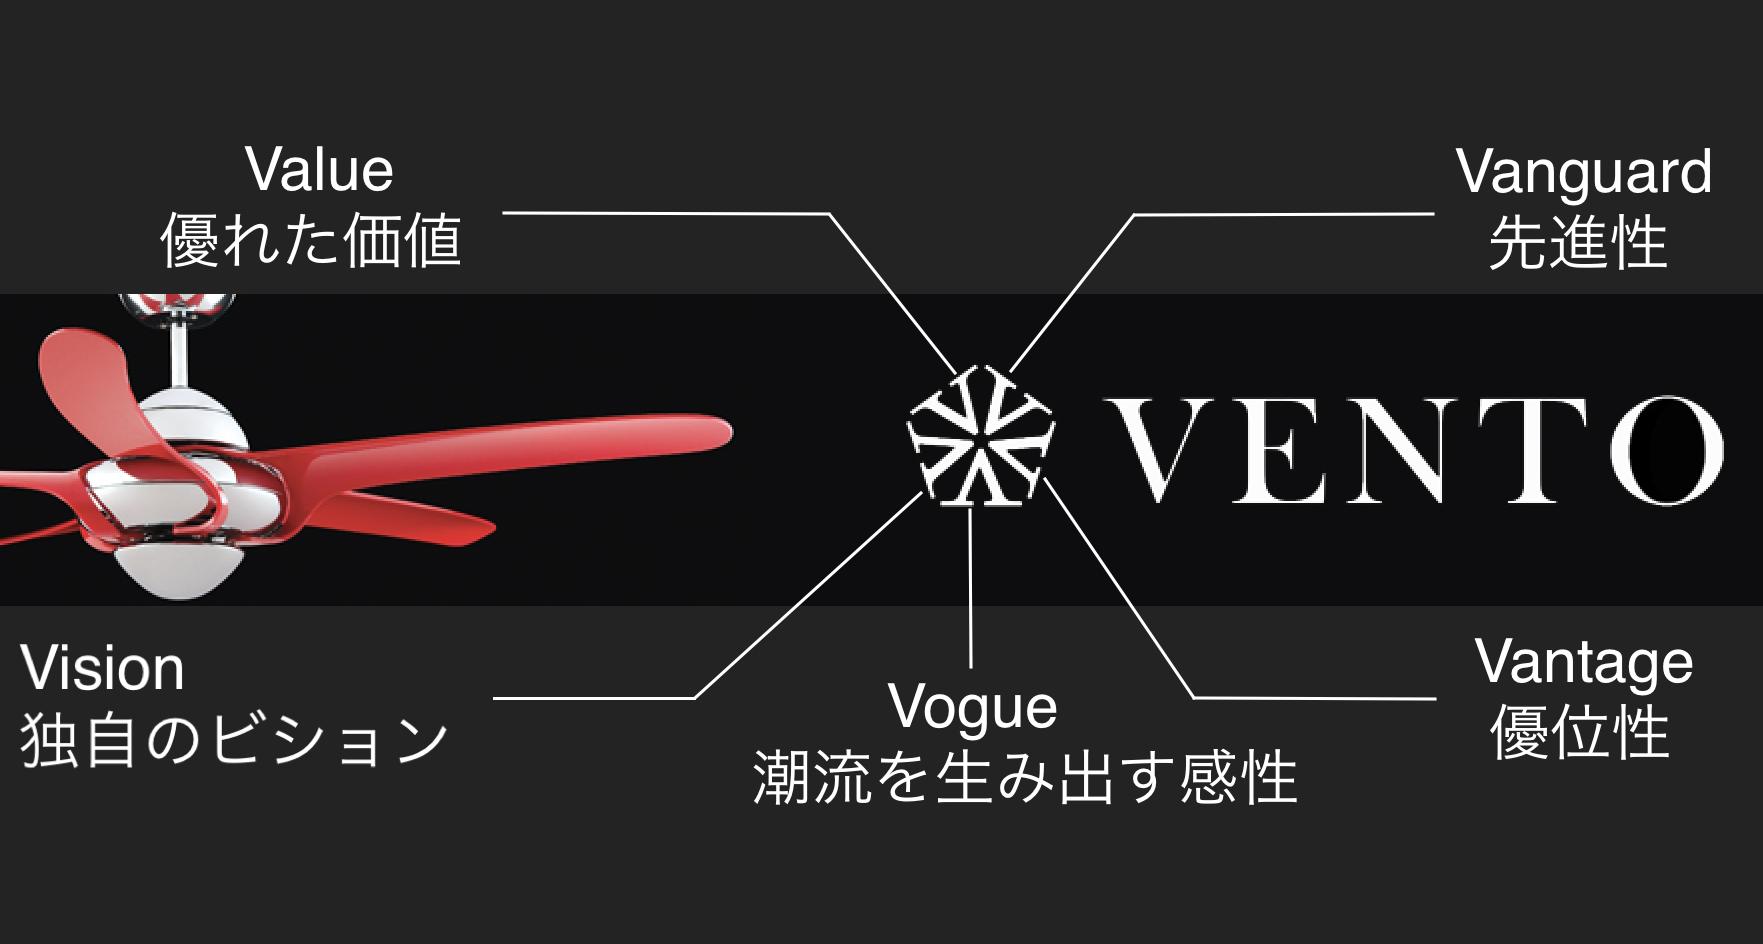 VENTO(ヴェント)シーリングファン 正規輸入販売 ハンターストア